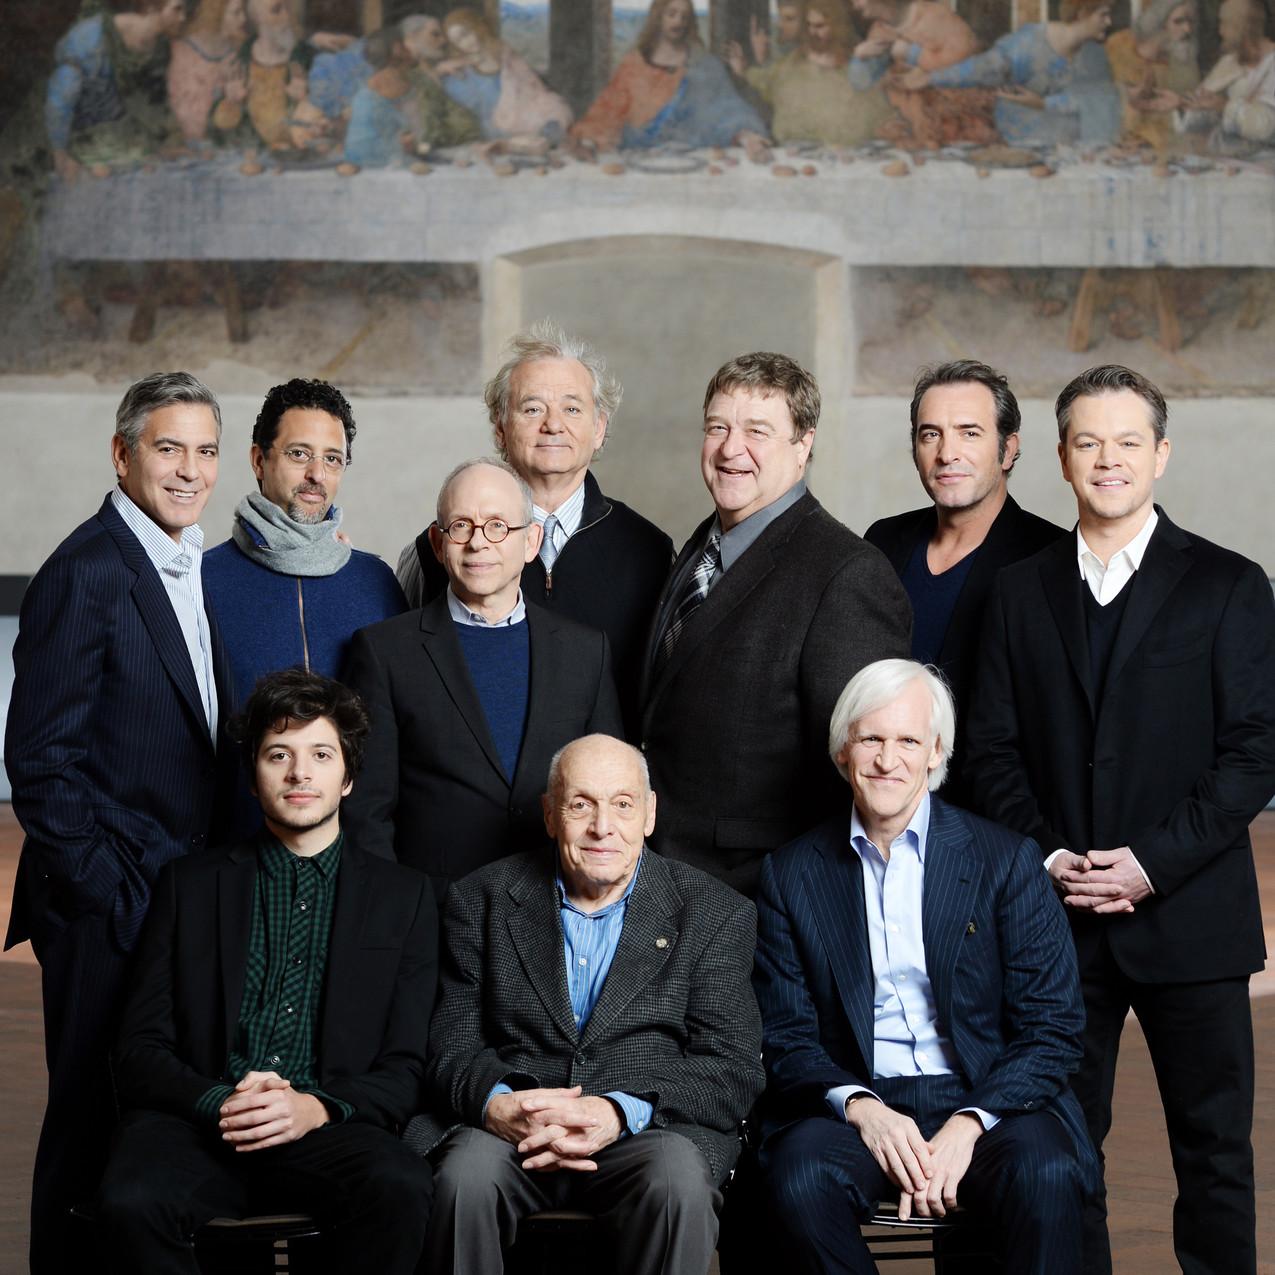 Cast of the Monuments Men